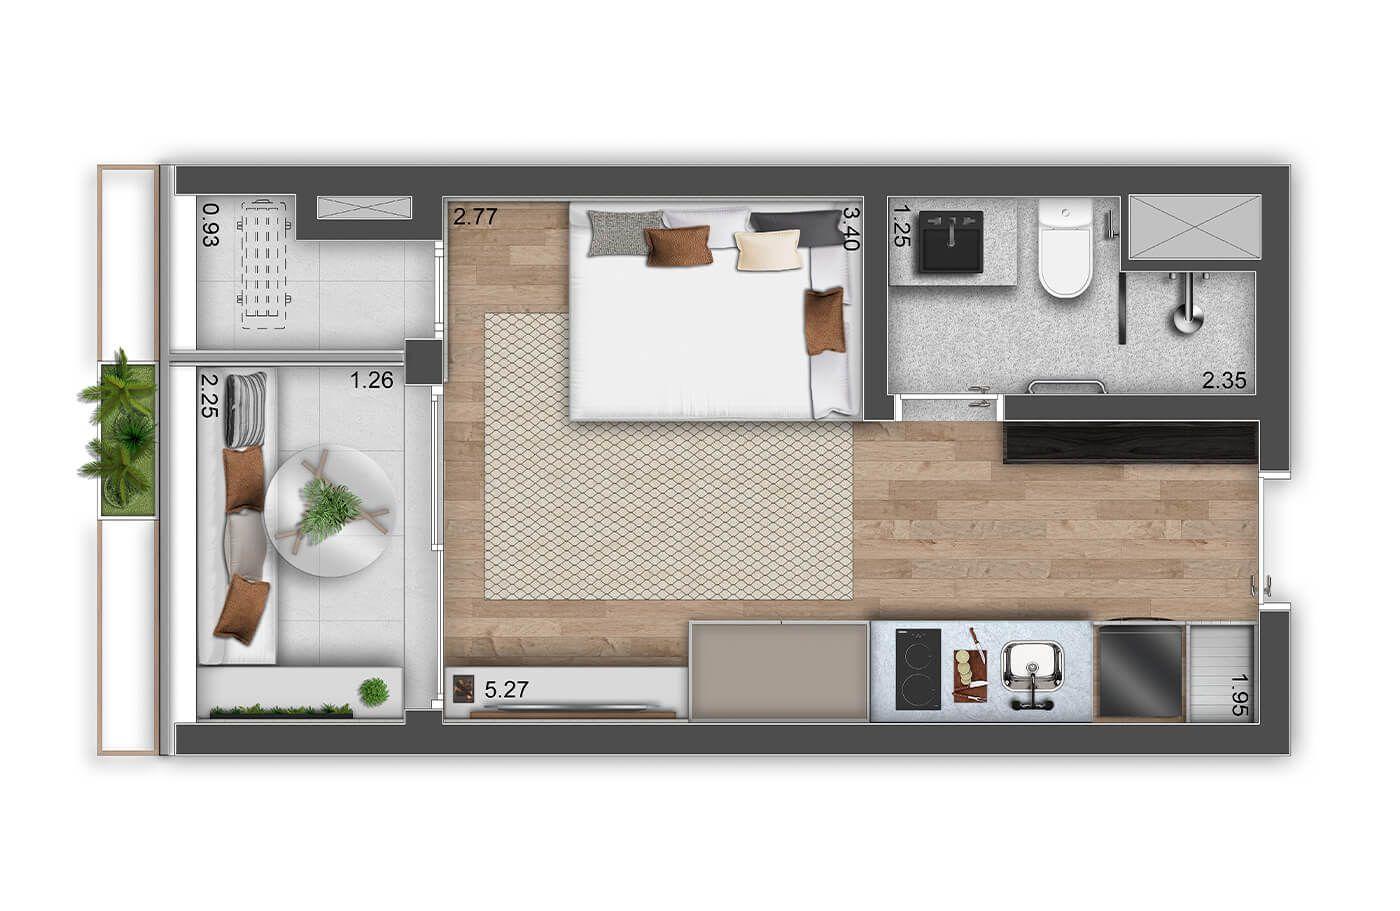 Planta do Haus Mitre Perdizes. floorplan